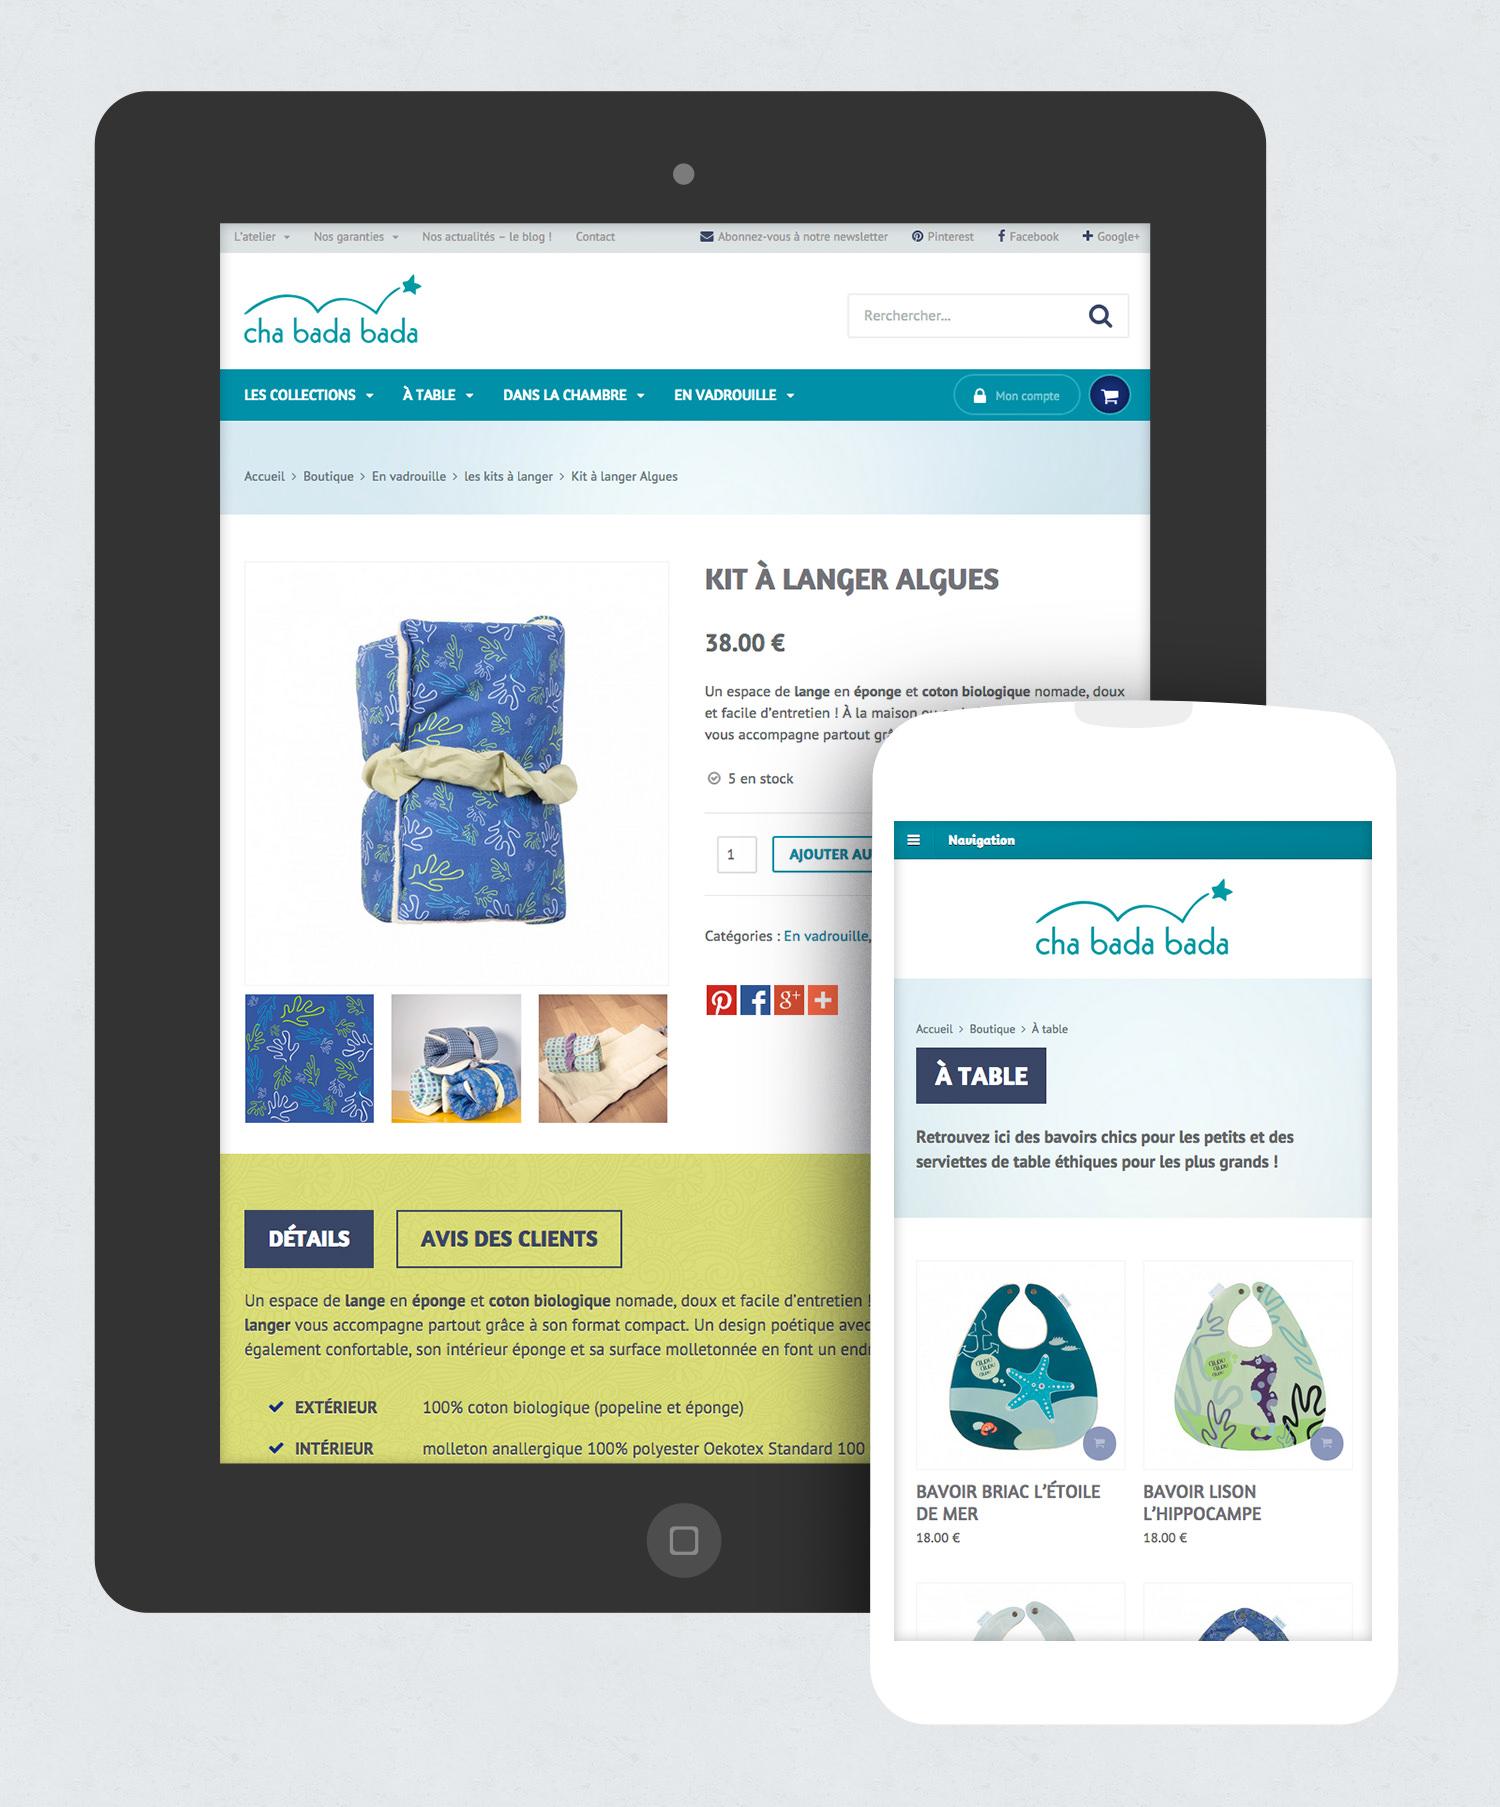 Design d'un thème WordPress WooCommerce responsive pour le site e-commerce Cha bada bada